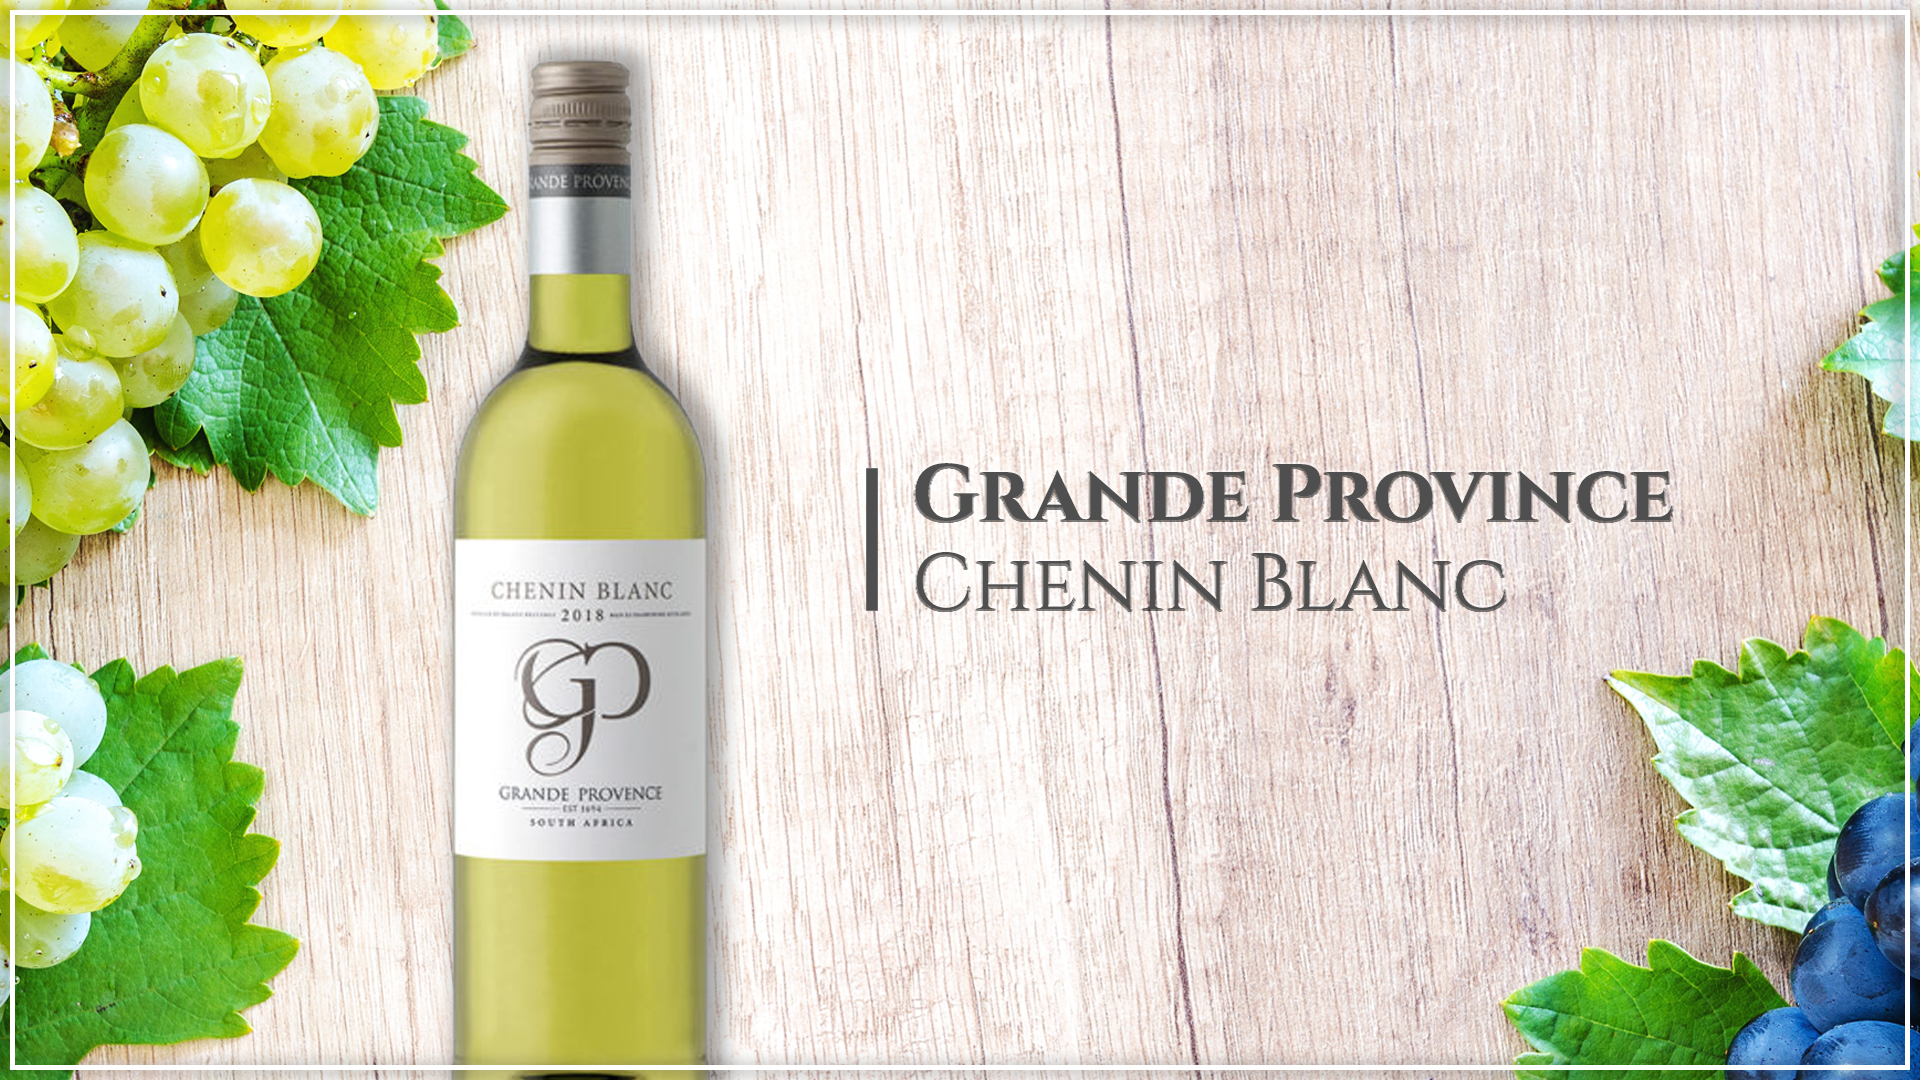 Grande Province Chenin Blanc